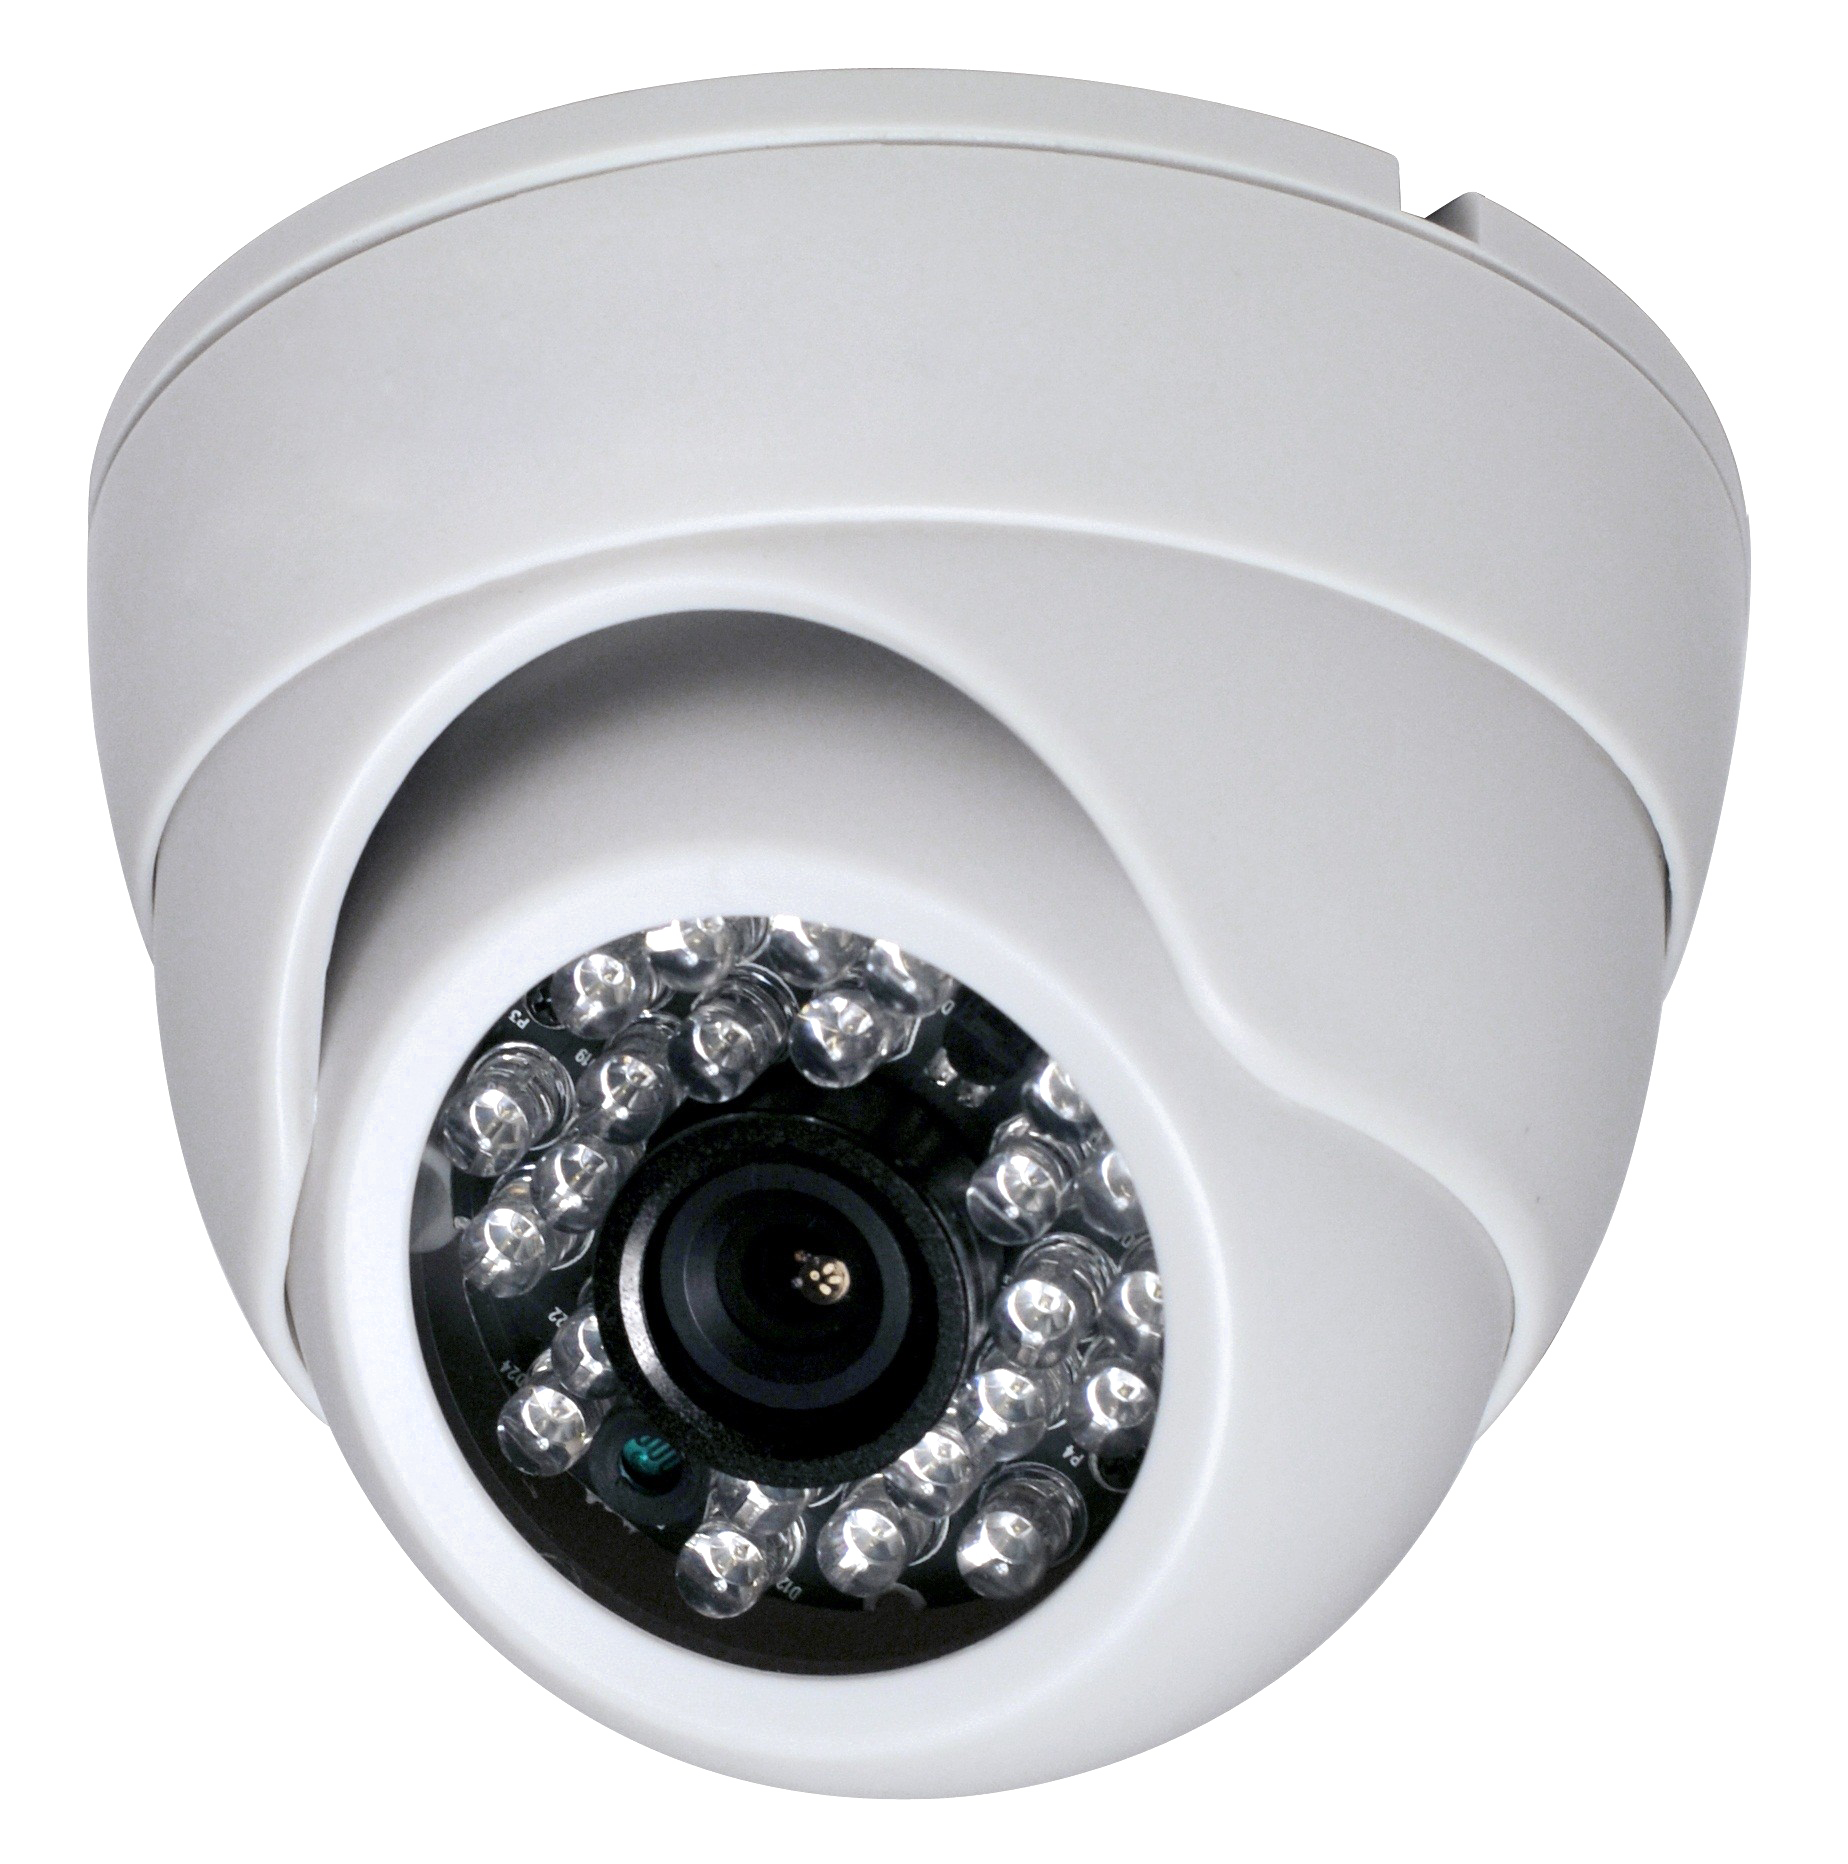 CCTV Dome Camera PNG Transparent Image SVG Clip arts